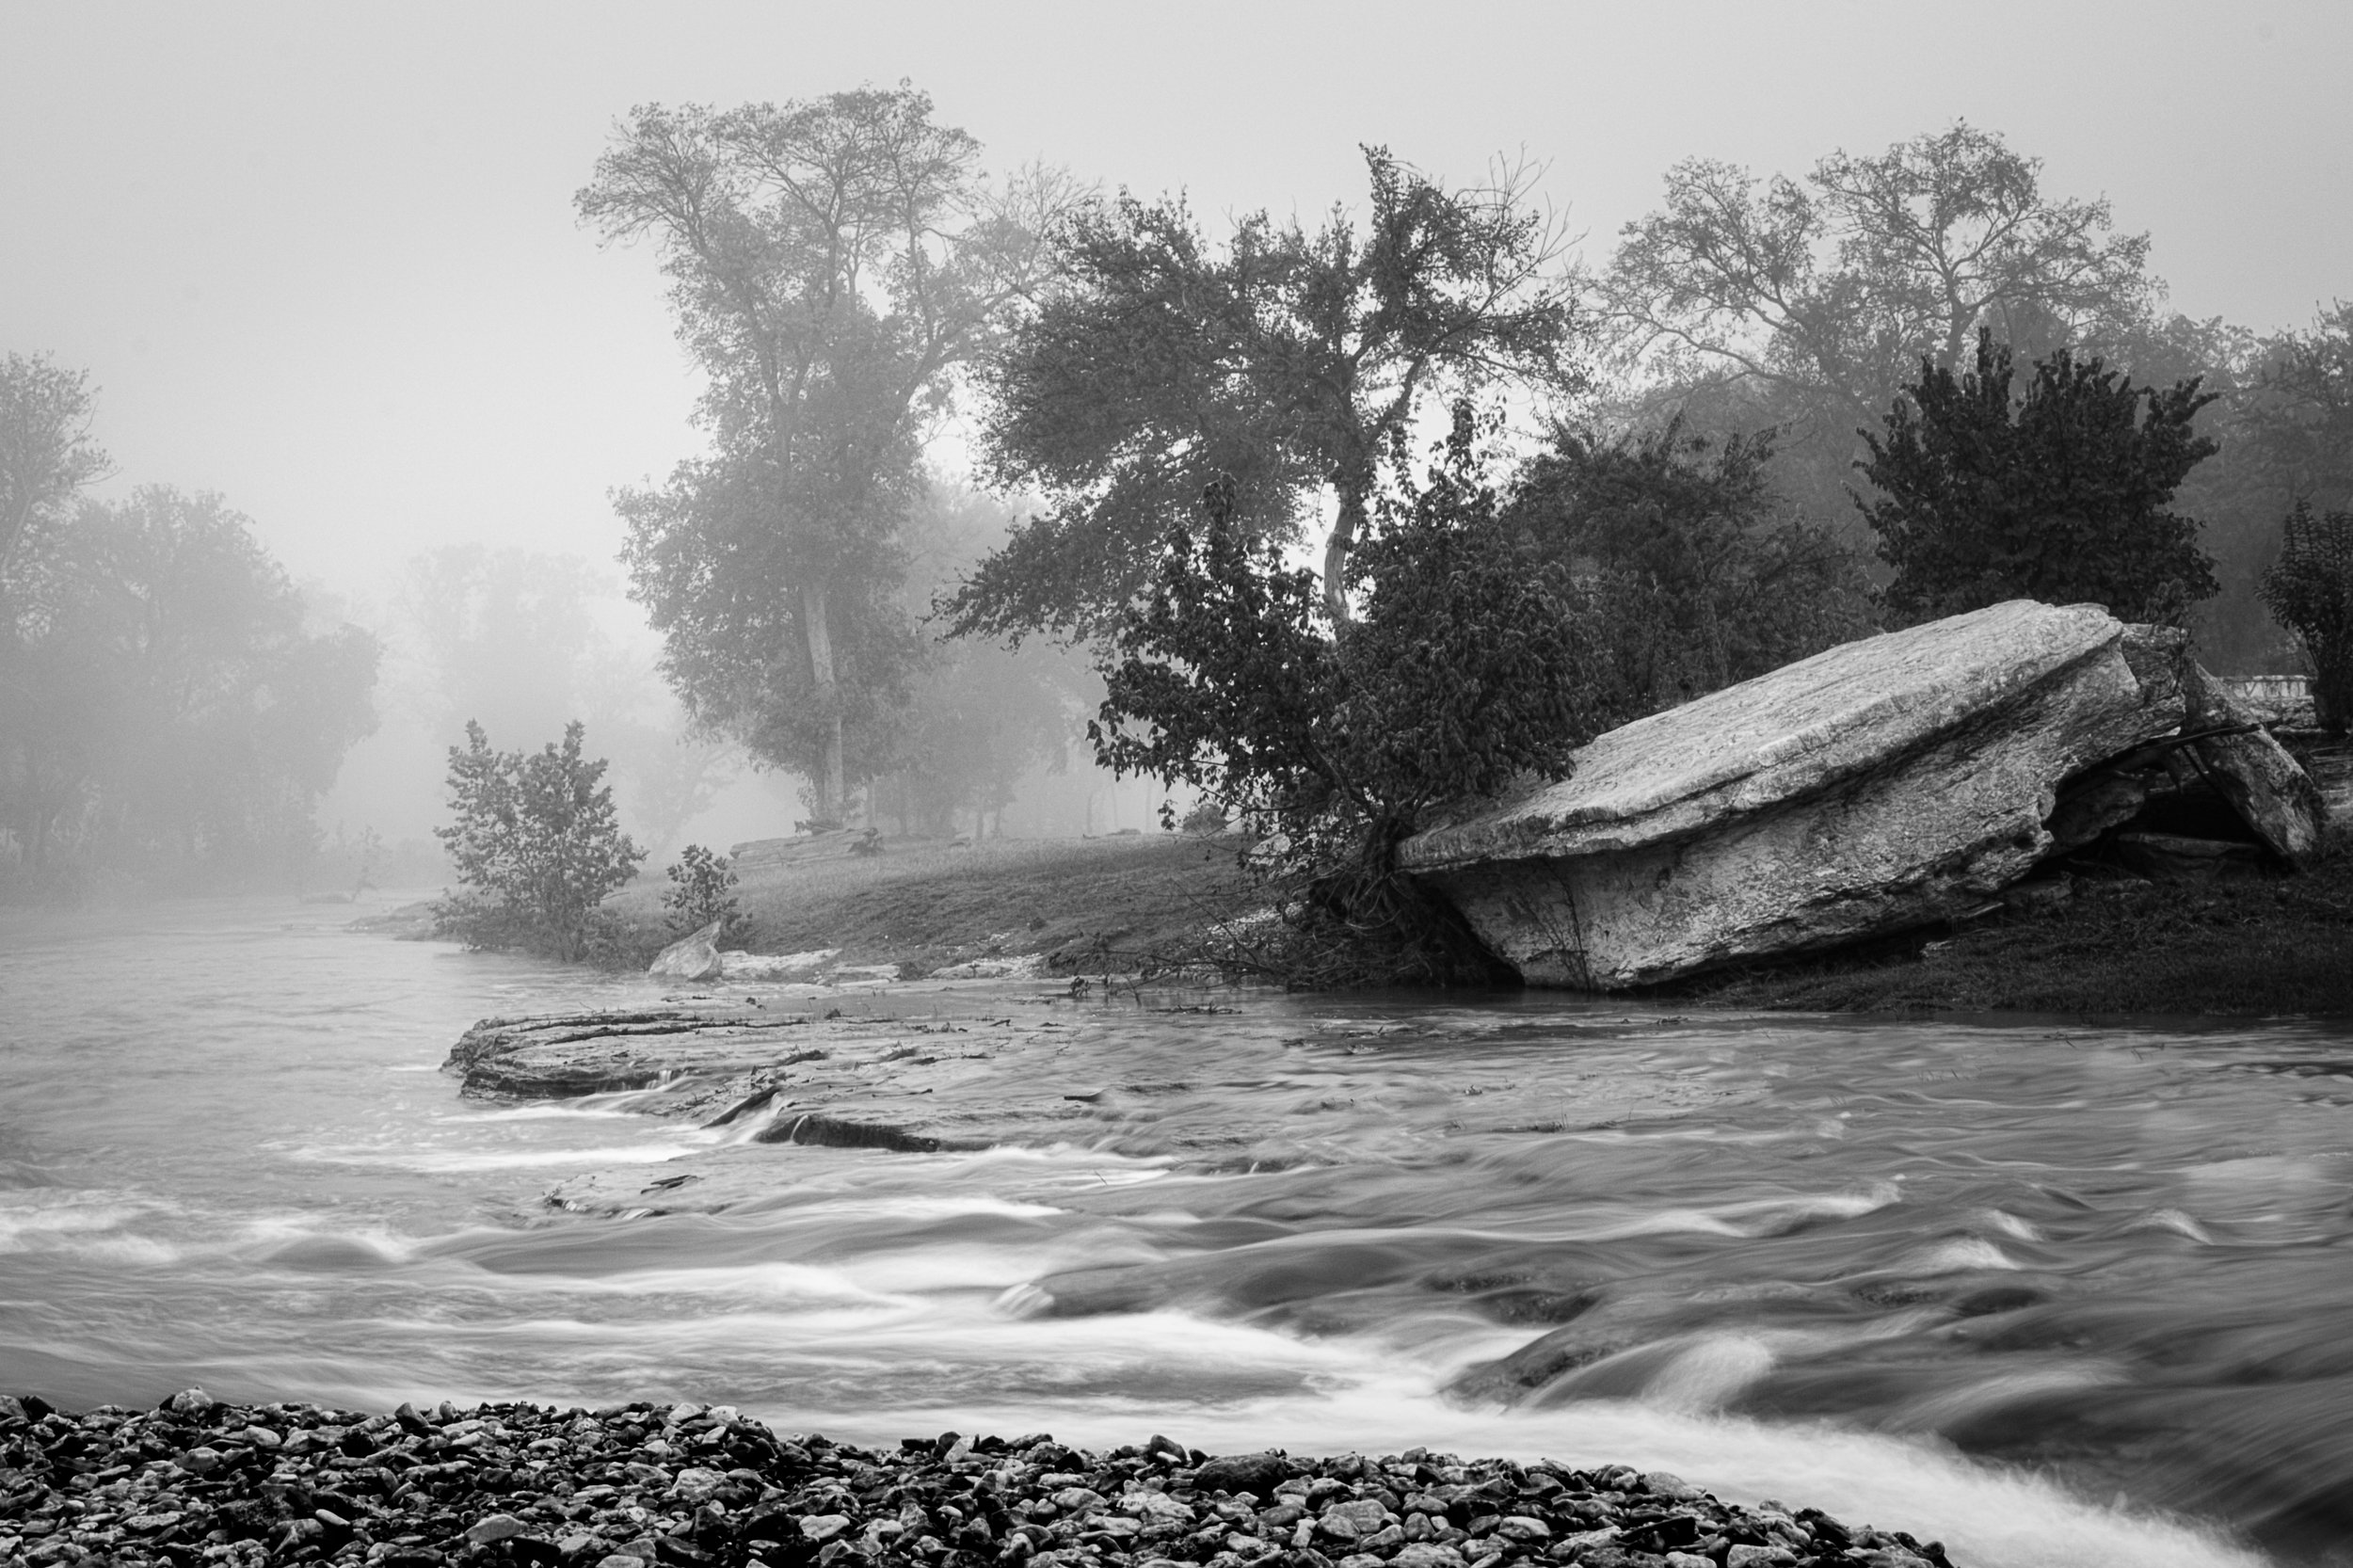 New Season Fog, Digital Photography, Copyright © 2015